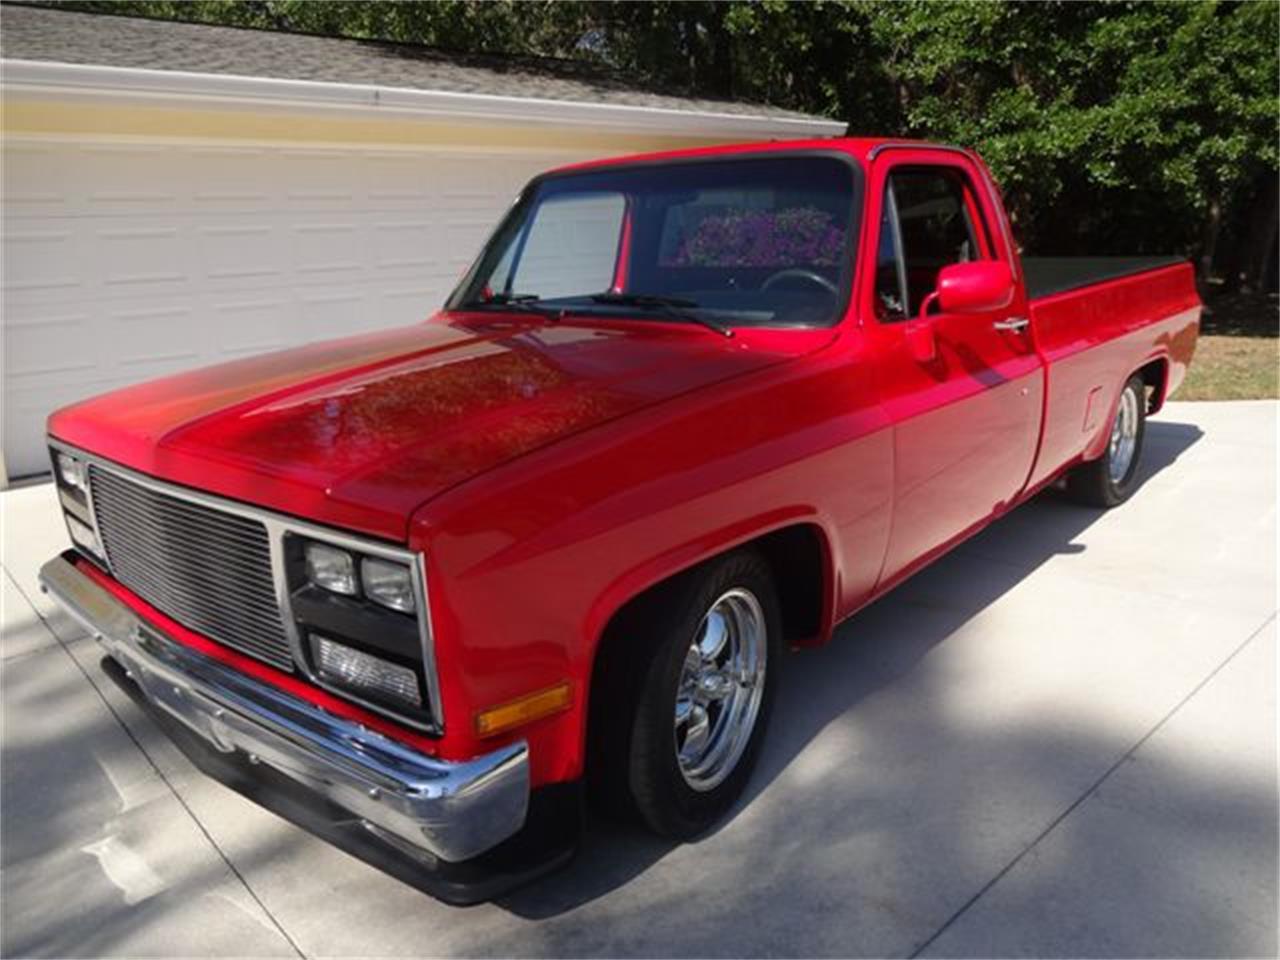 1982 Chevrolet Silverado (CC-1083978) for sale in Sarasota, Florida